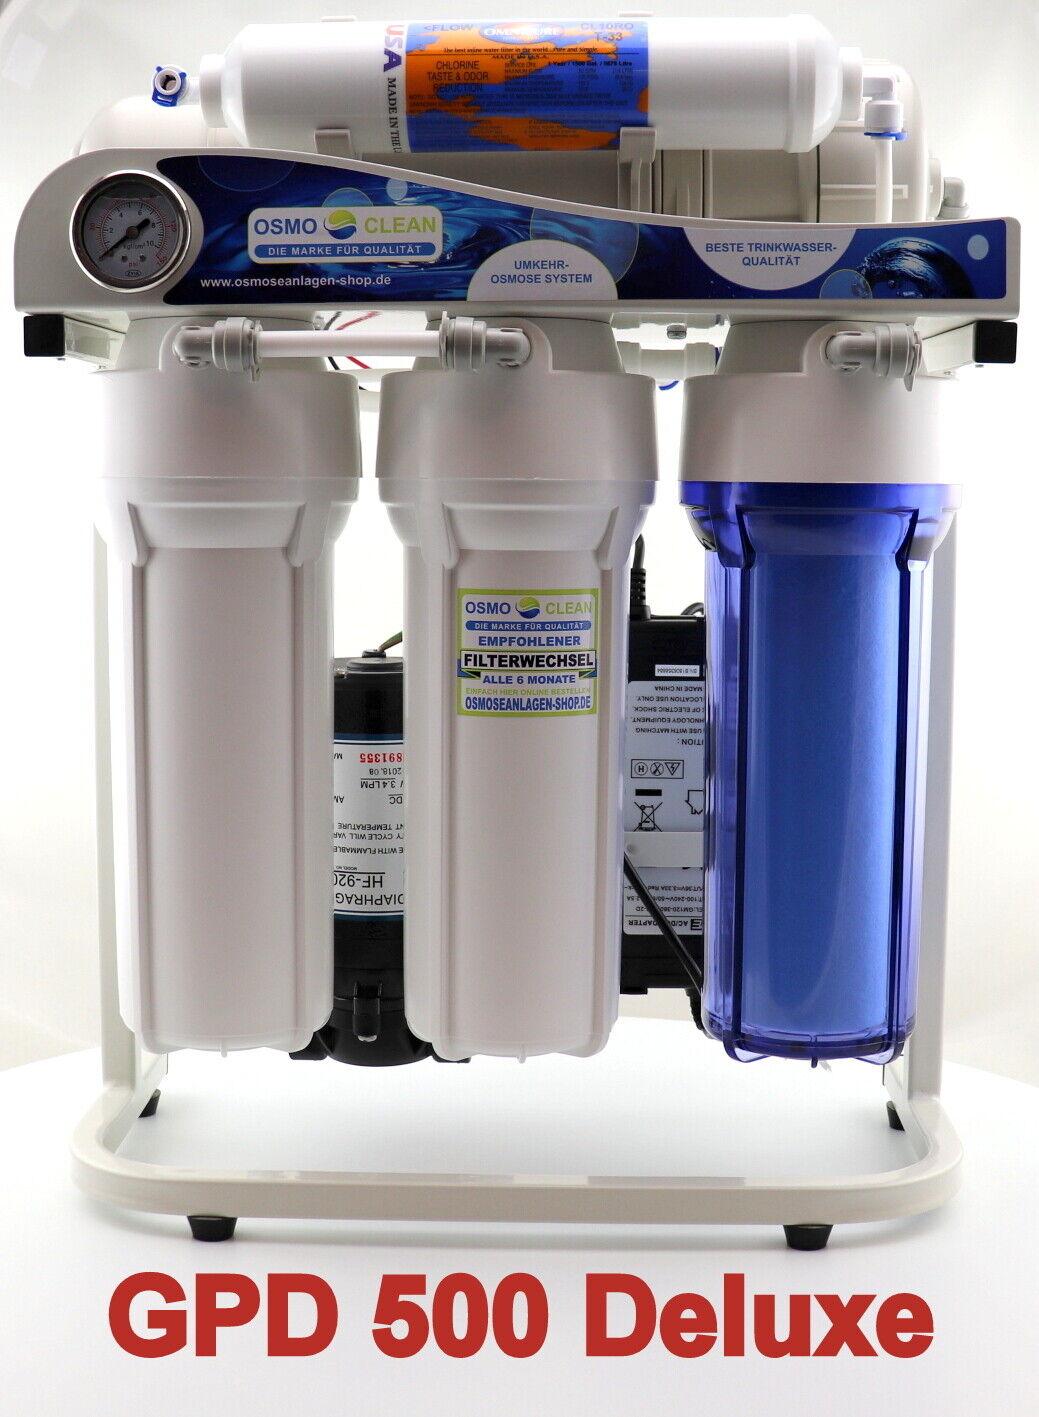 Osmoseanlage DELUXE Titan Exklusive 500 GPD ca.1.900 LTag, Wasserfilter, Sanic